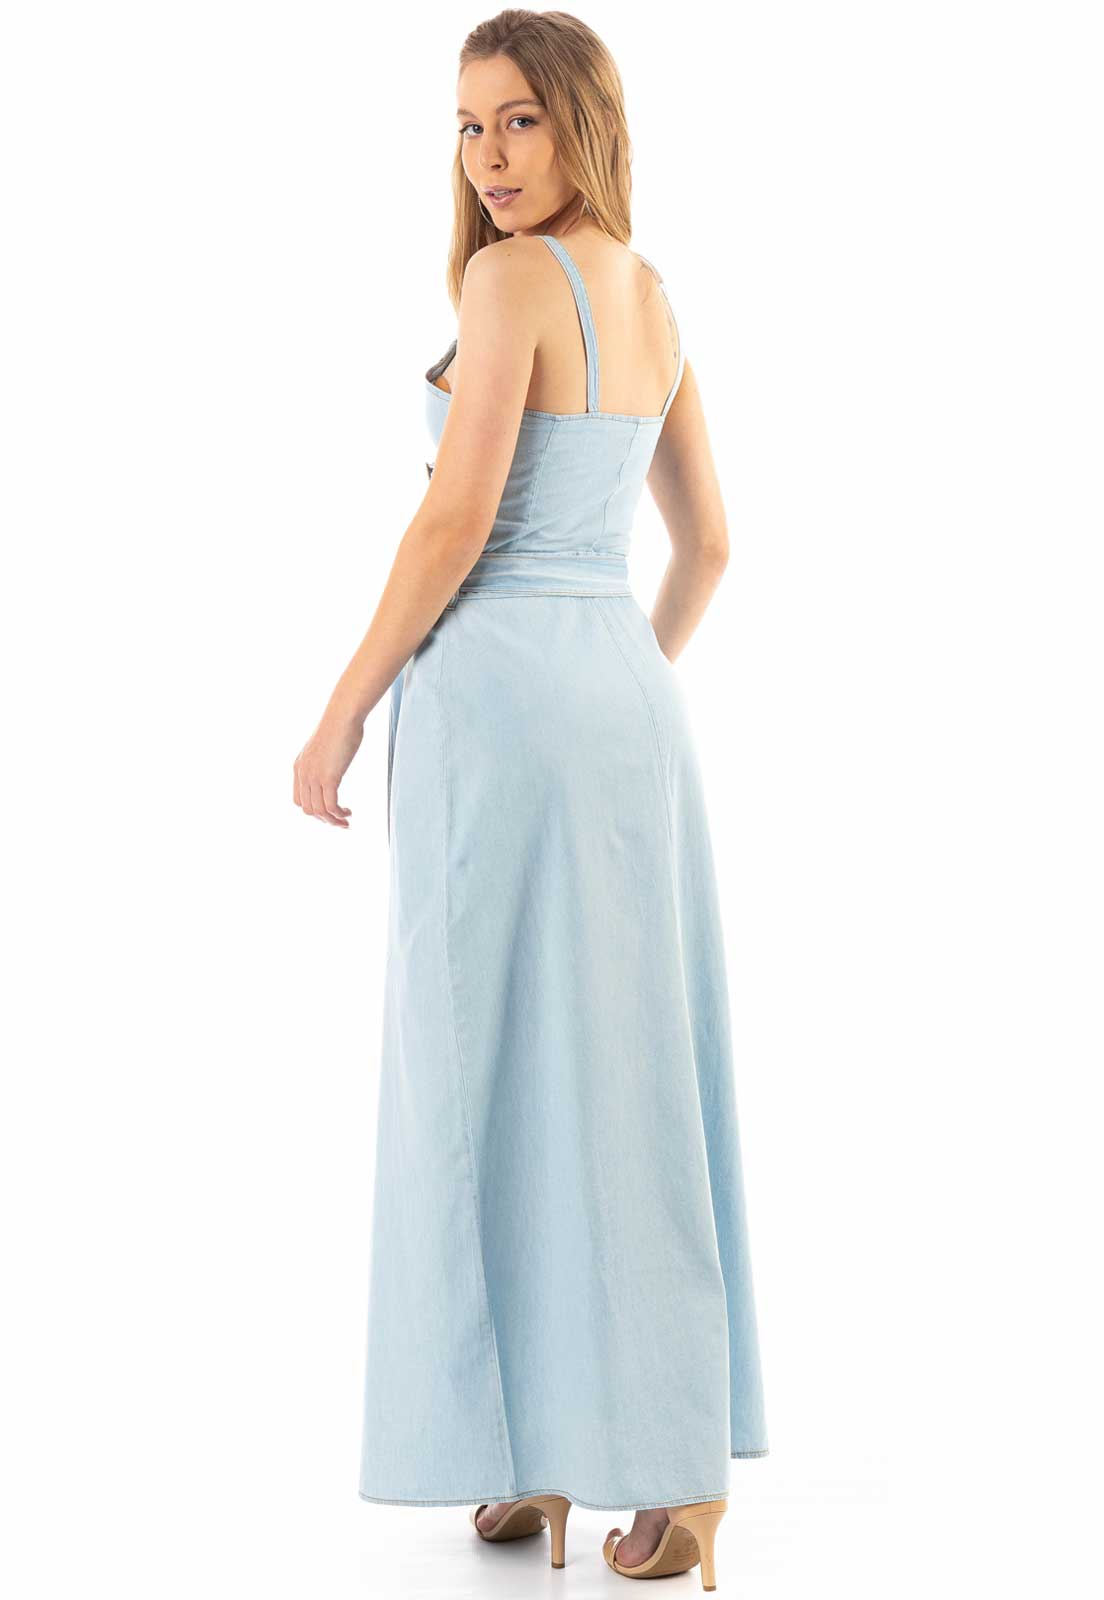 Vestido Dioxes Jeans Longo Azul Claro